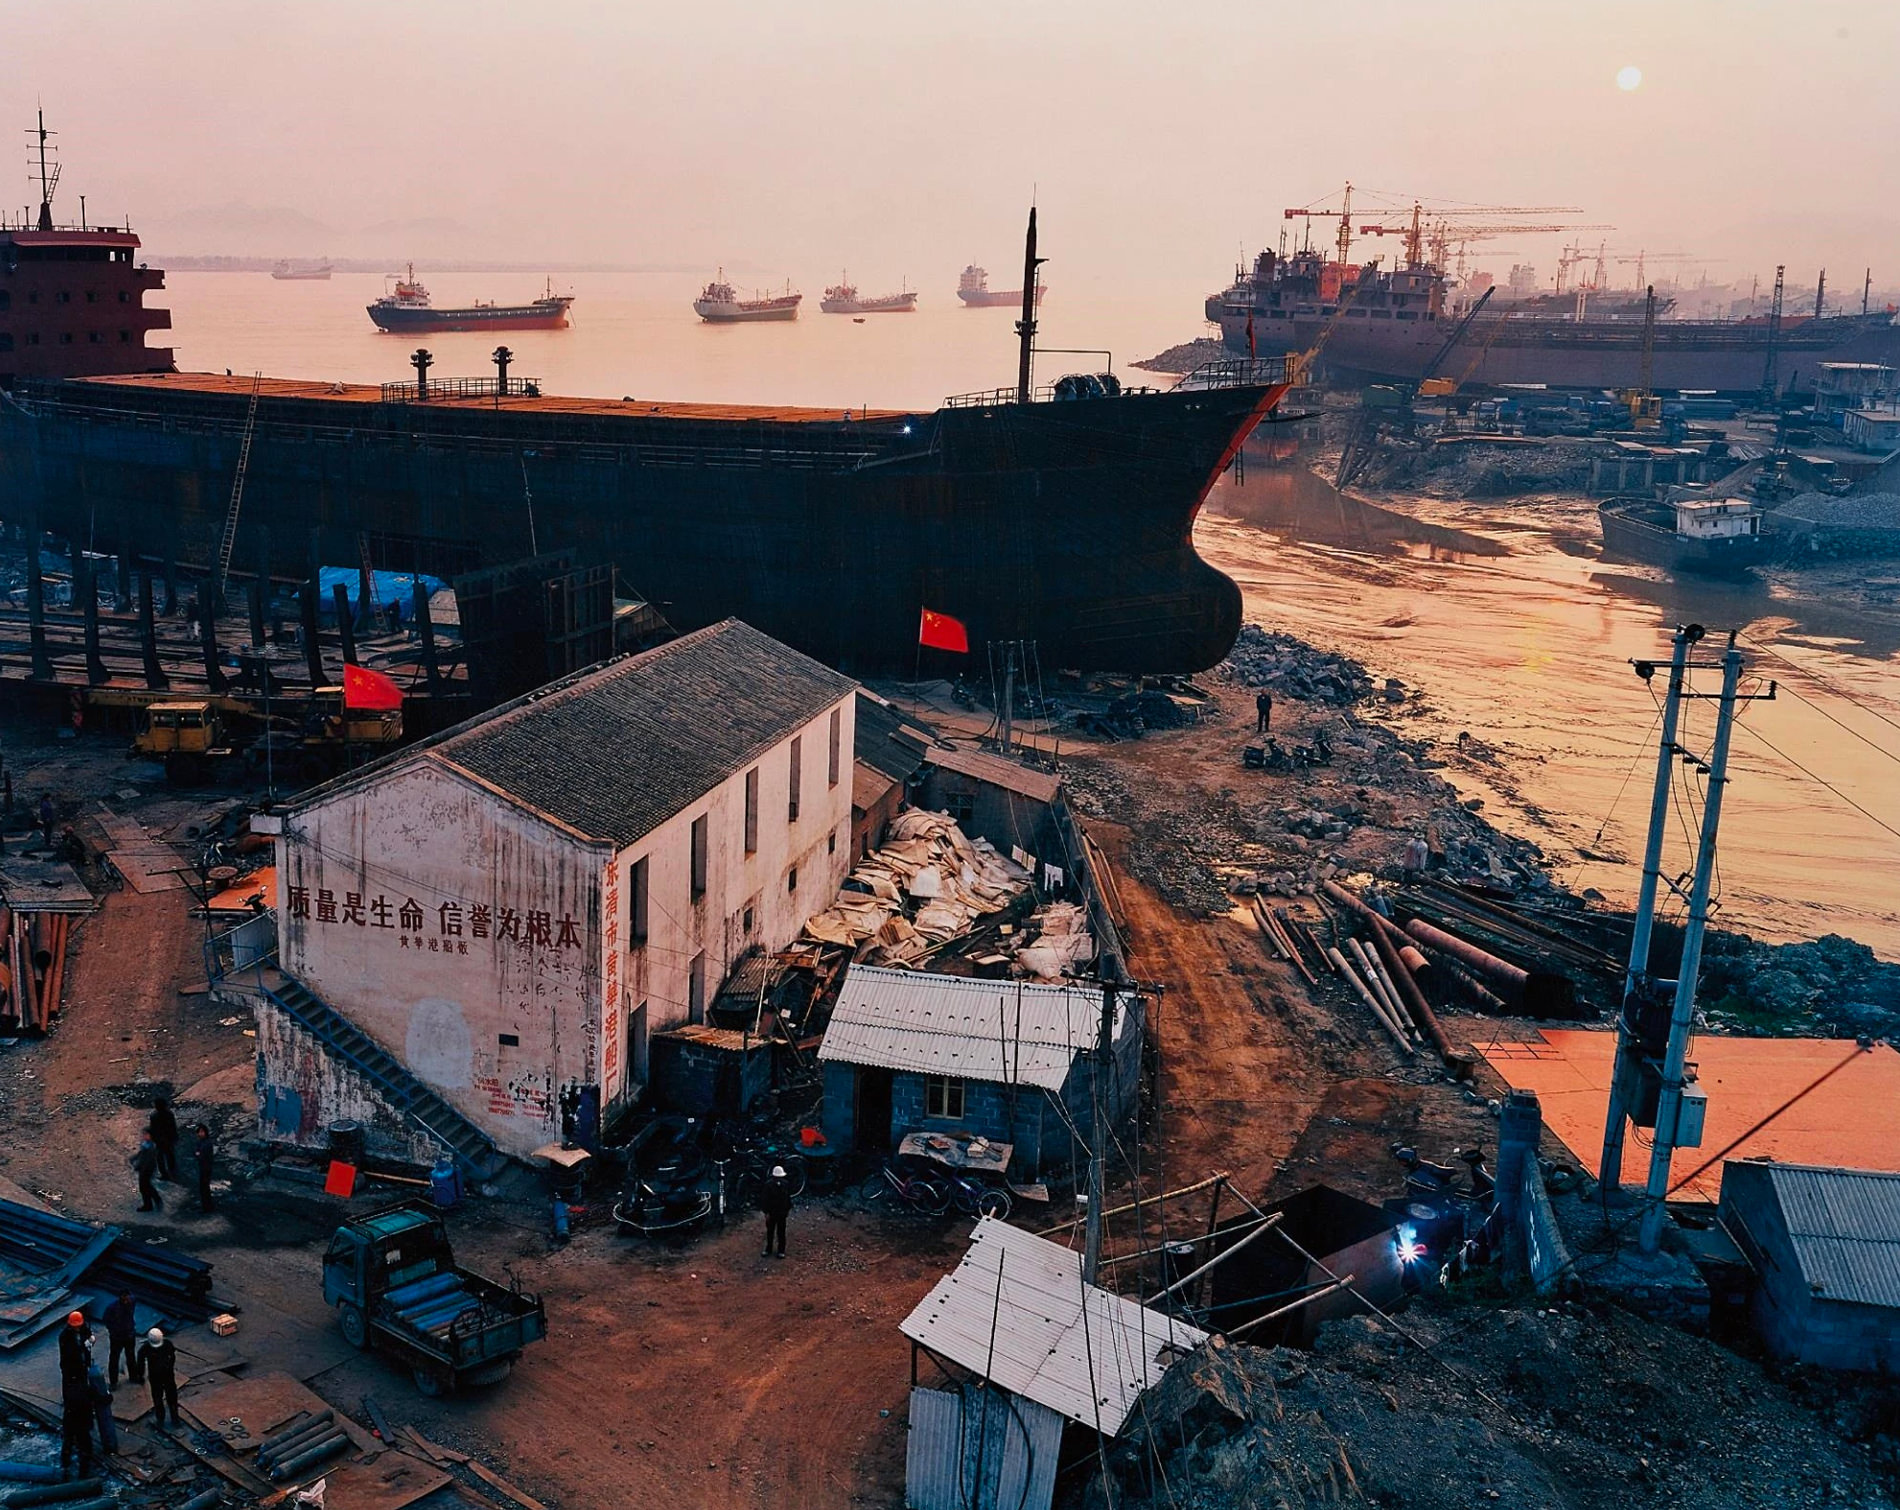 Edward Burtynski Photographie Shipyard No5 Qili Port Zhejiang Province Chine 2004